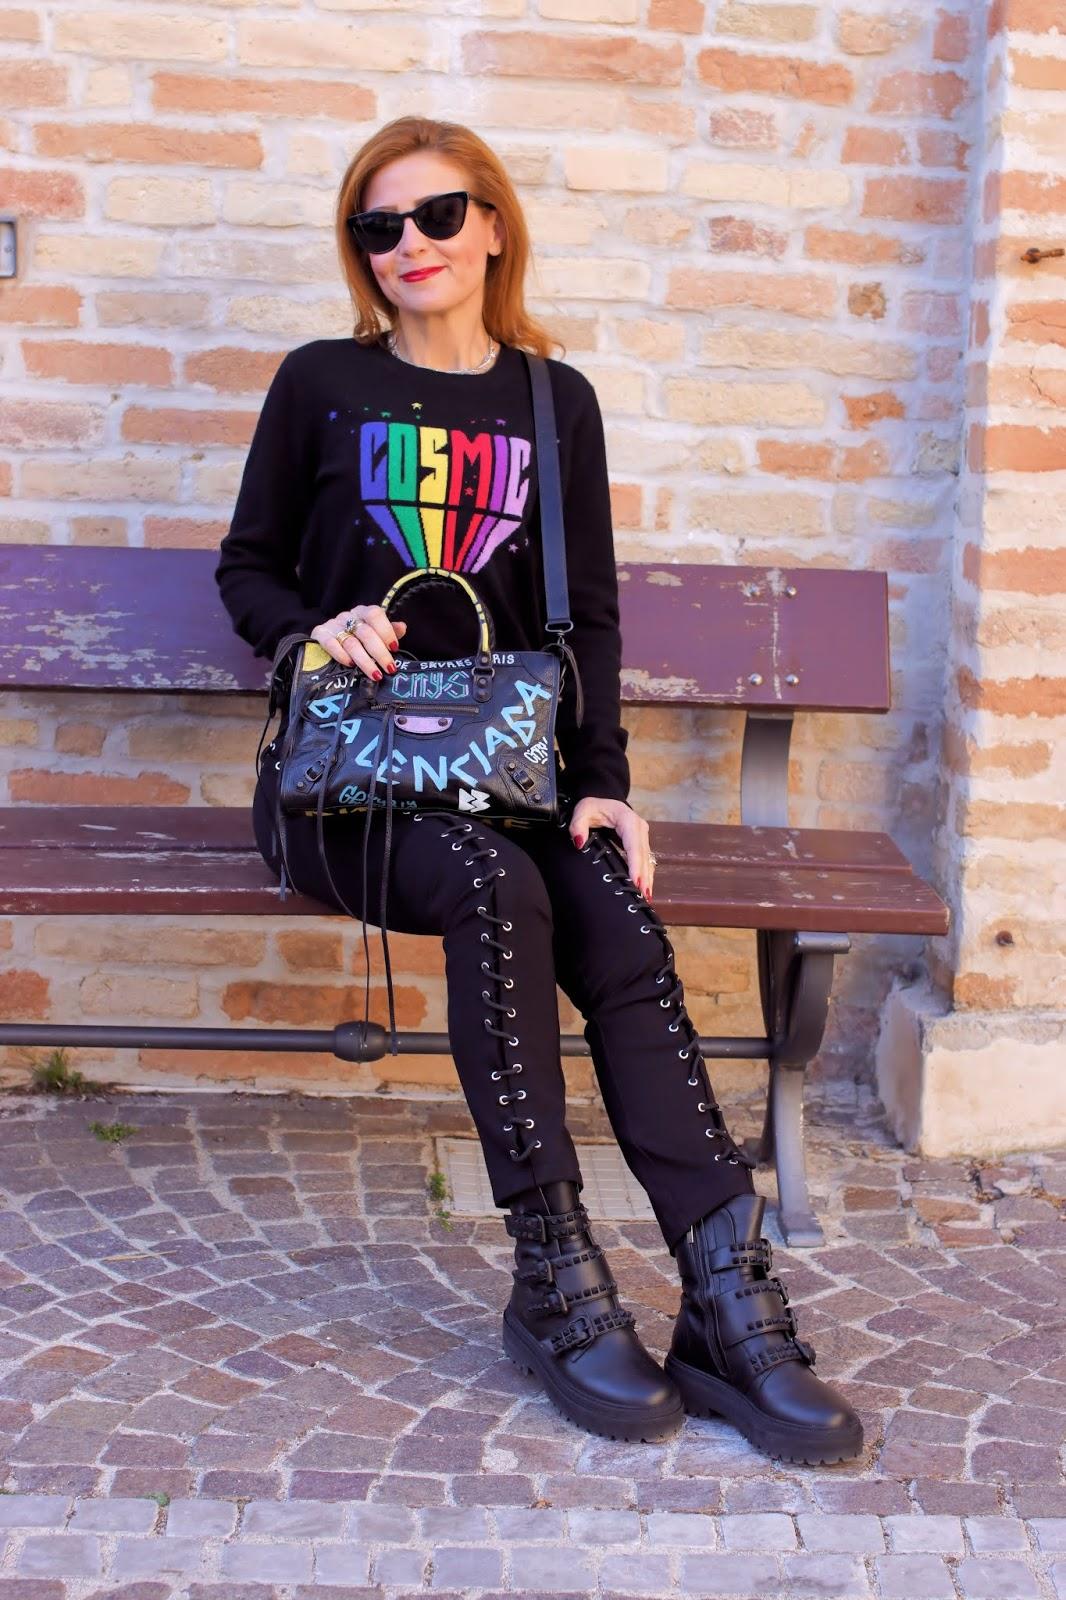 Rocker chick style with my Balenciaga graffiti bag on Fashion and Cookies fashion blog, fashion blogger style